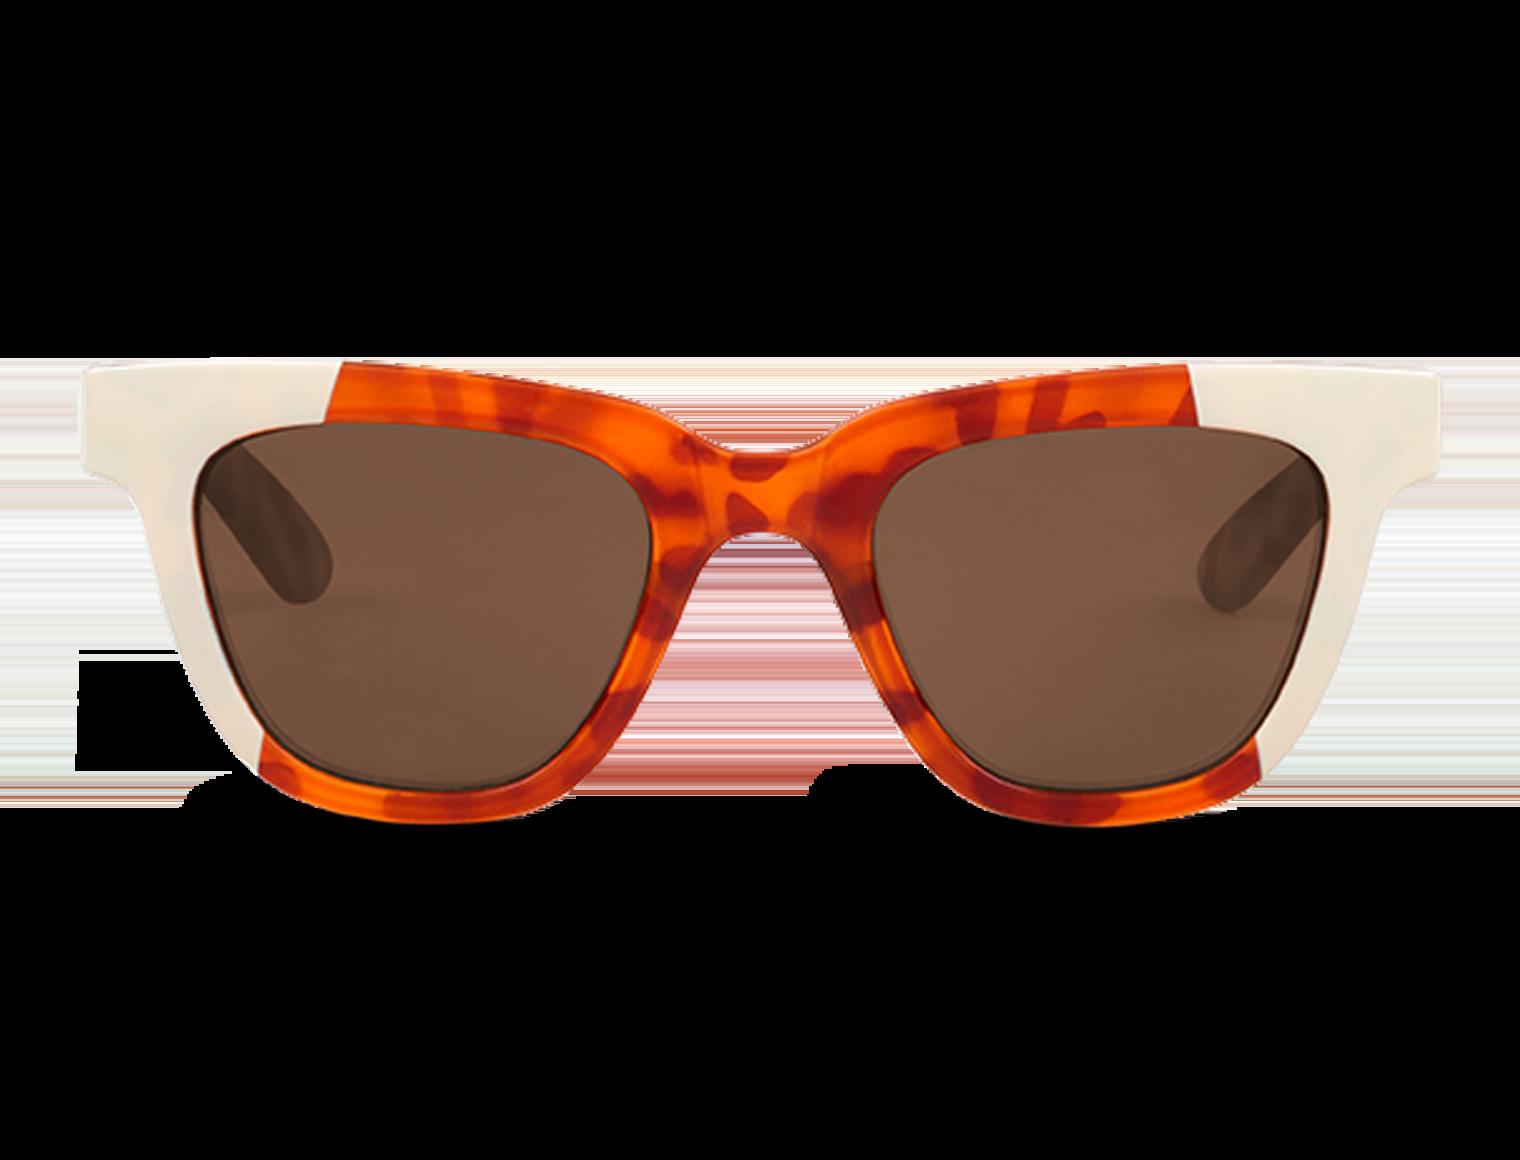 LETRAS | CREAM/LEO TORTOISE with classical lenses